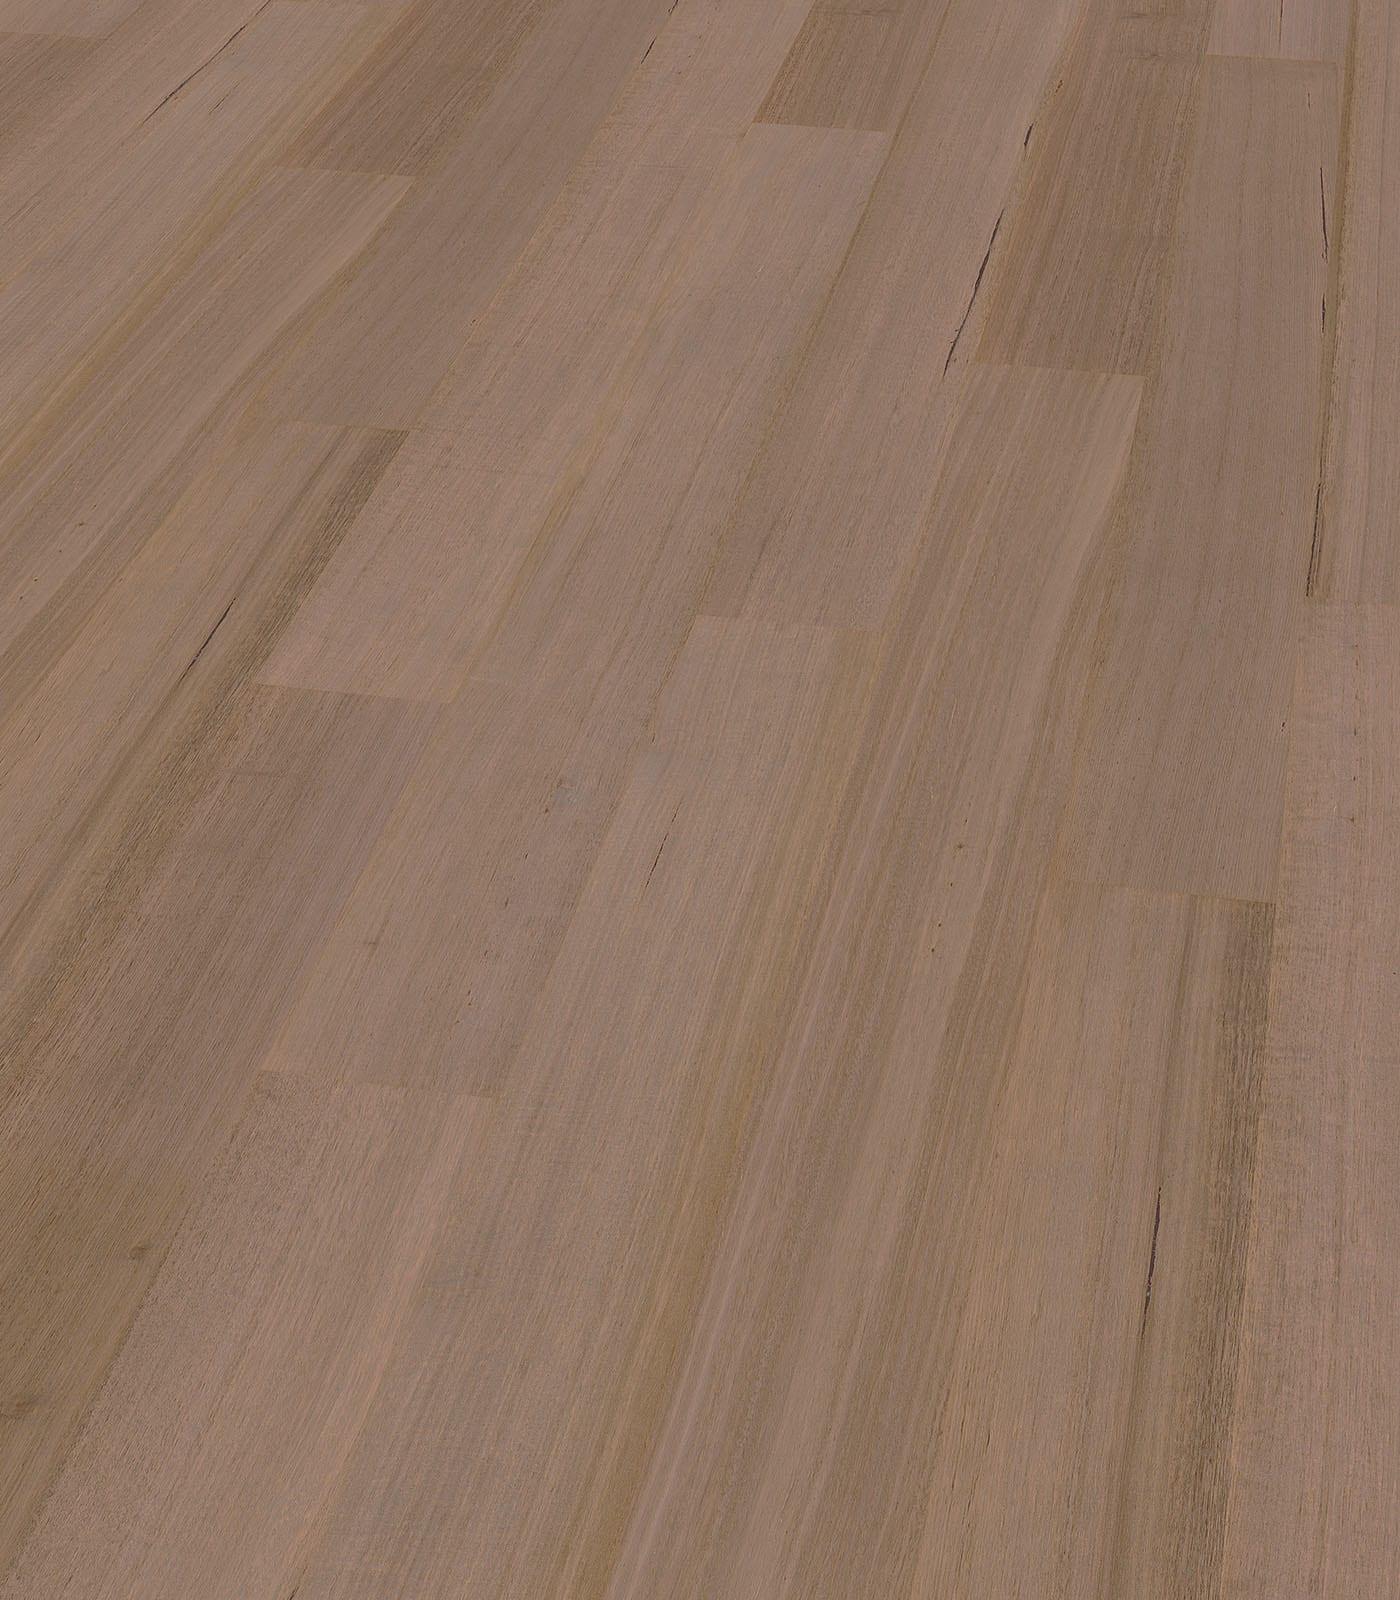 Geelong-engineered Tasmanian Oak flooring